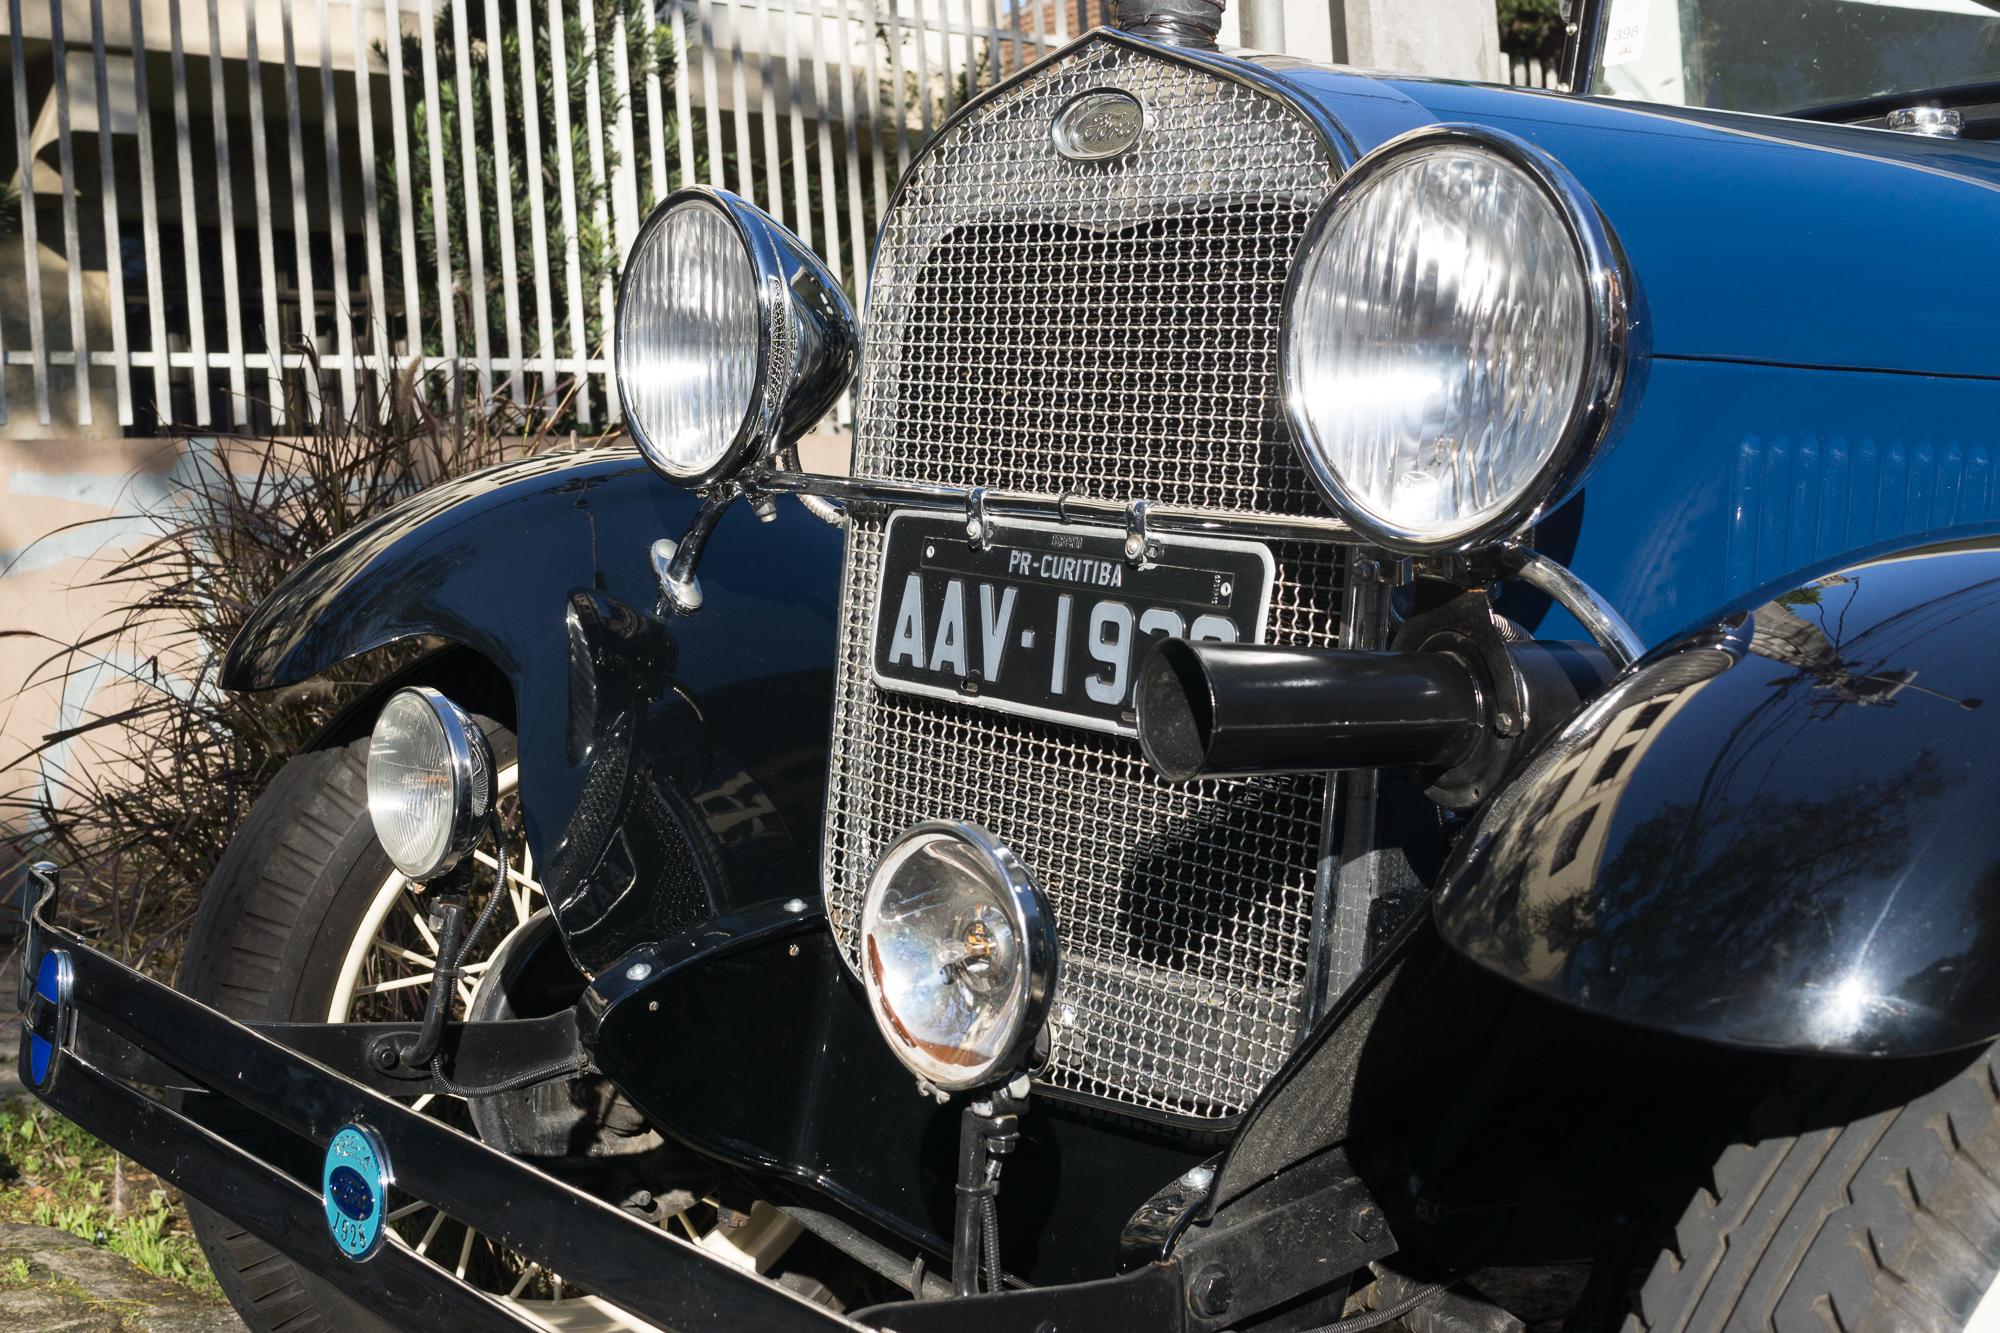 A pre-world war 2 model car